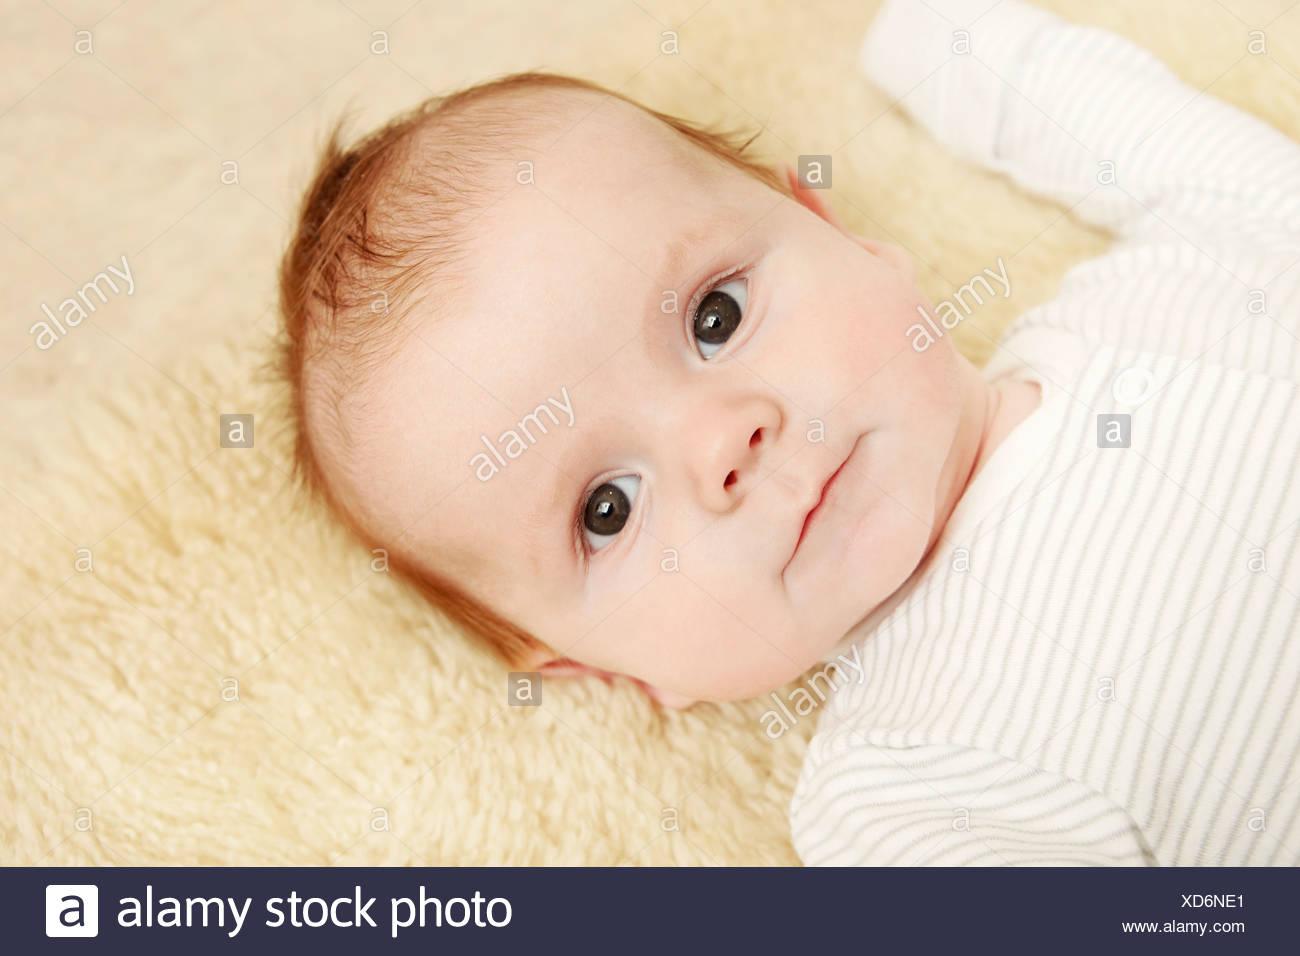 Di due mesi di età Bimbo giacente sulla coperta di pelliccia Immagini Stock